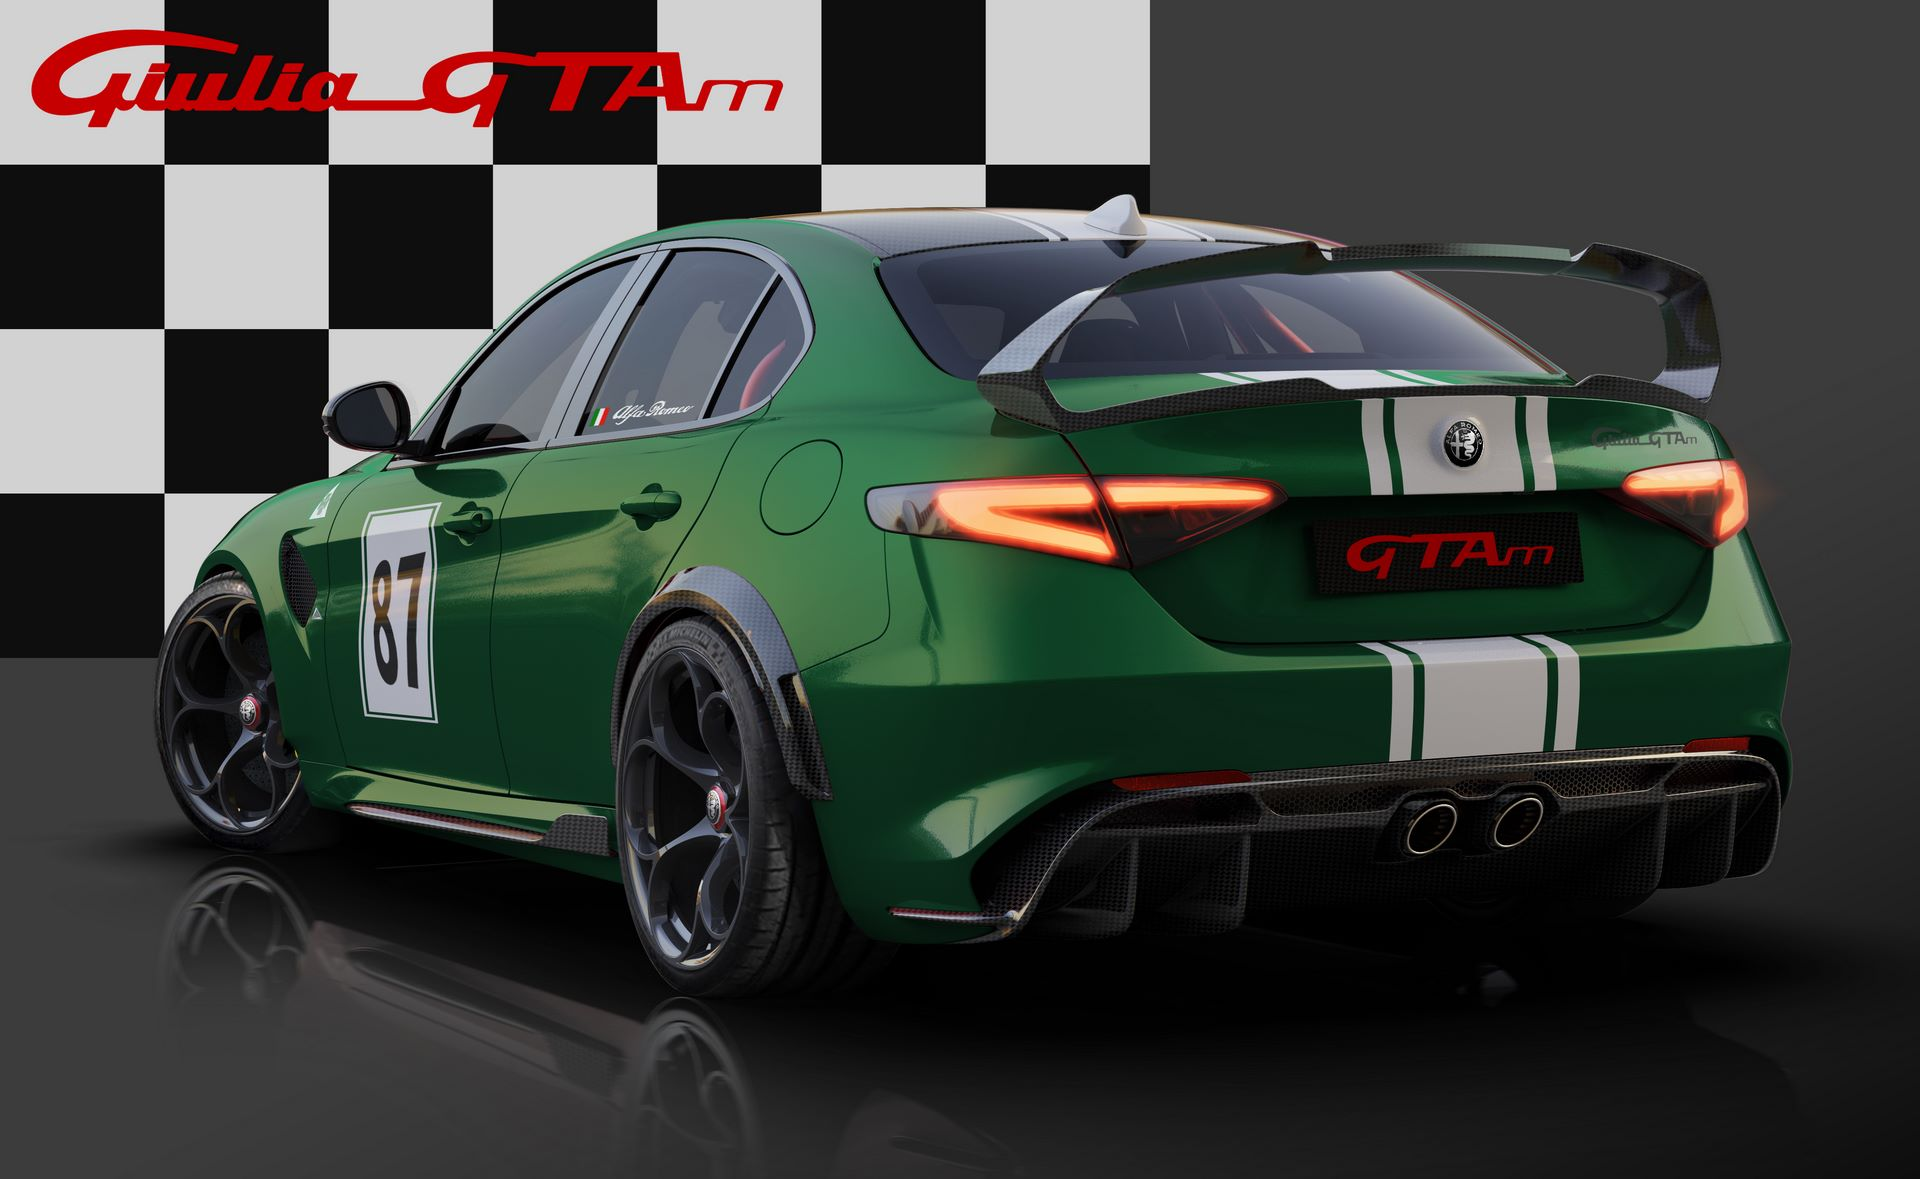 17_Alfa-Romeo-Giulia-GTA-dedicated-Livery